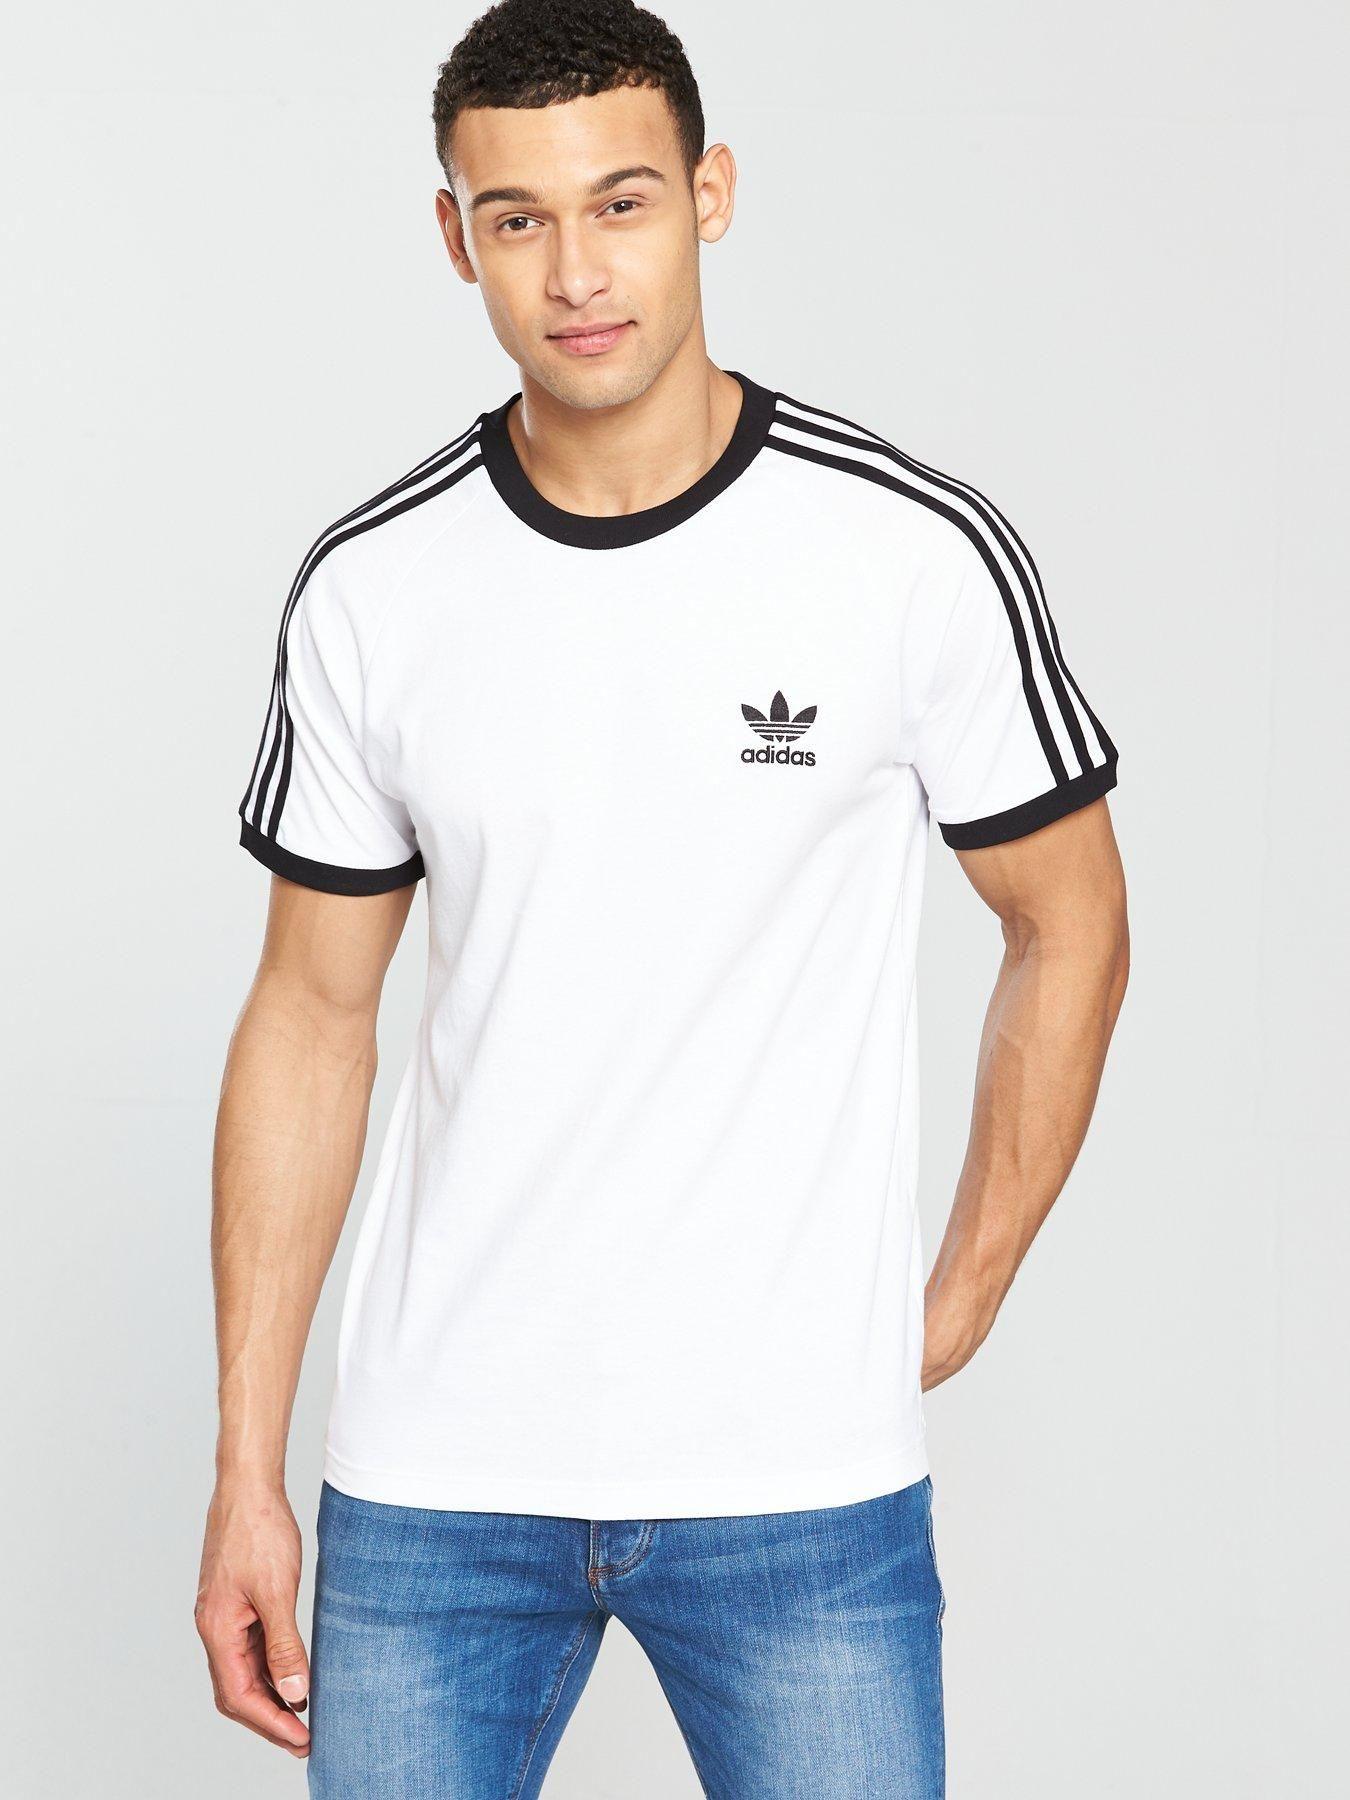 Men Adidas Originals T Shirt Shirt California Shopping